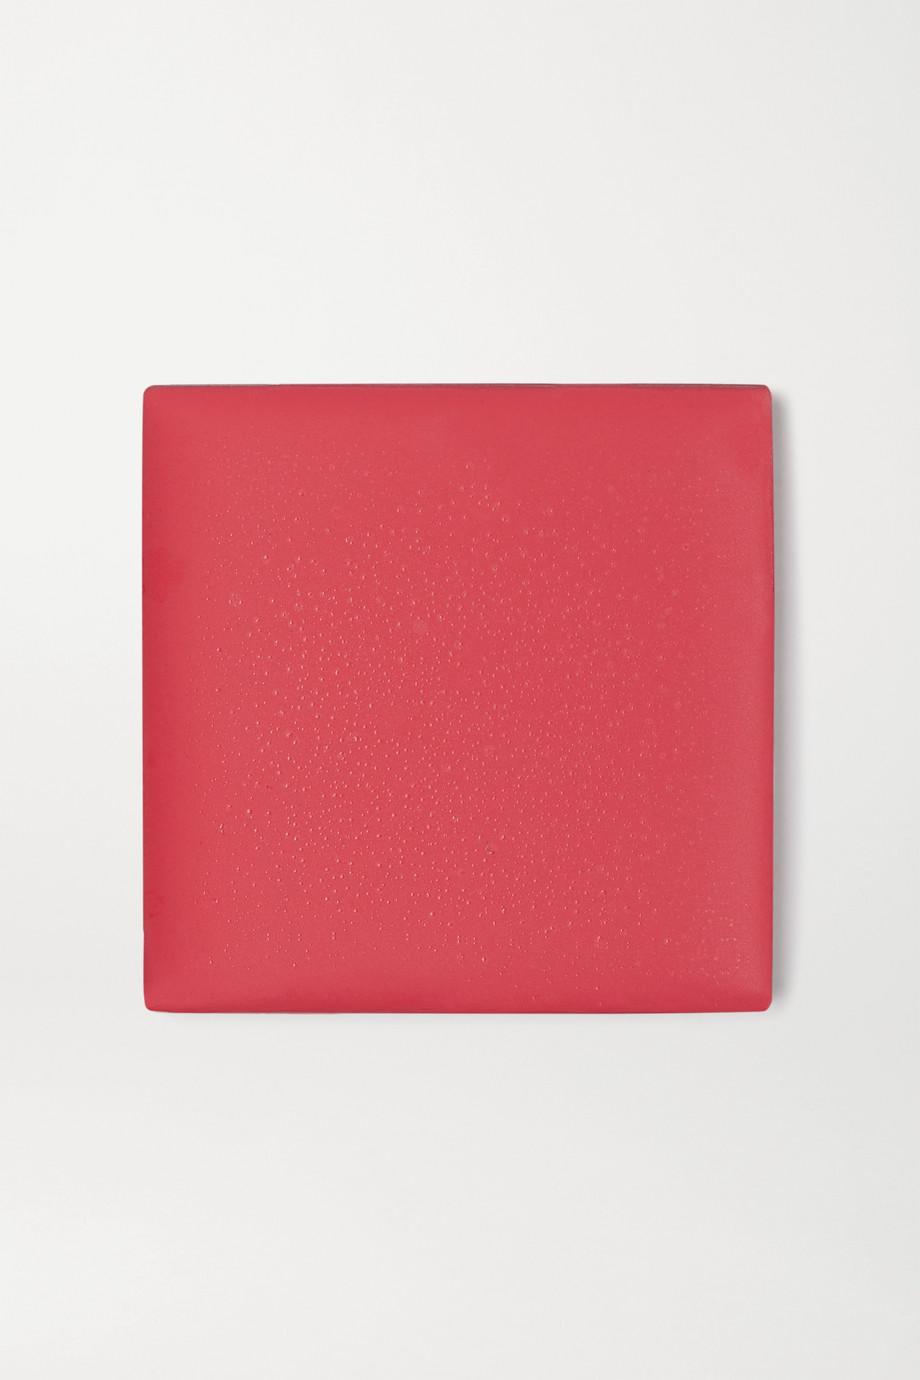 Kjaer Weis Cream Blush Refill - Above and Beyond